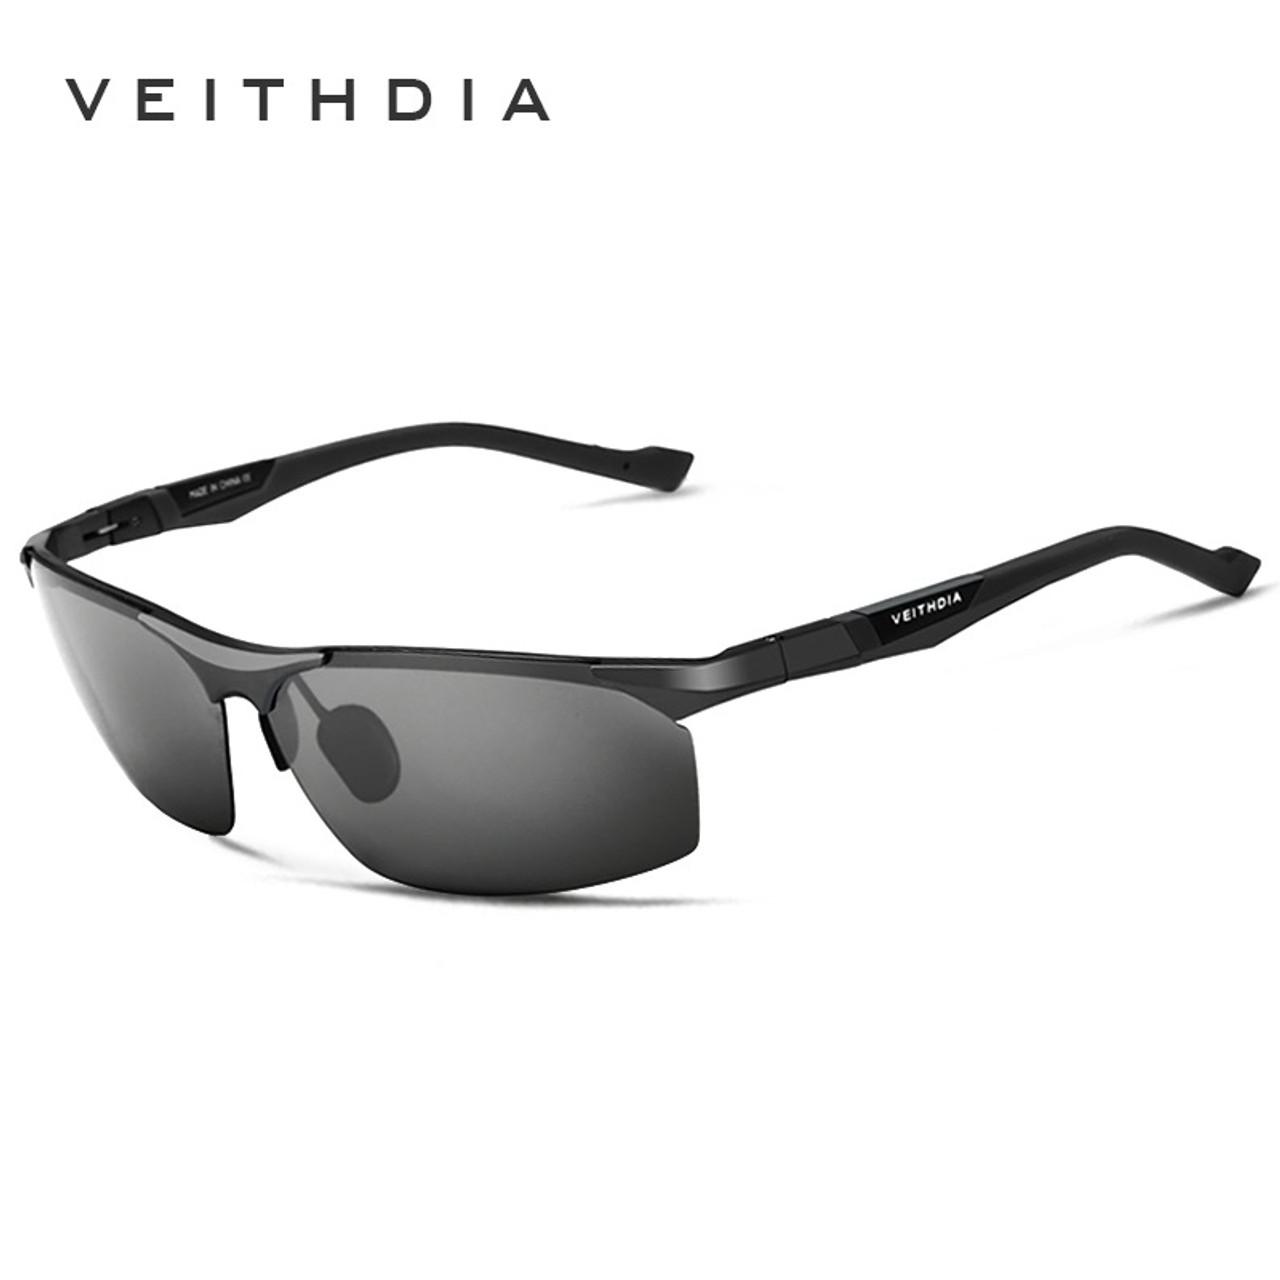 e938c791e ... VEITHDIA Polarized Sunglasses Men New Arrival Brand Designer Sun Glasses  With Original Box gafas oculos de ...